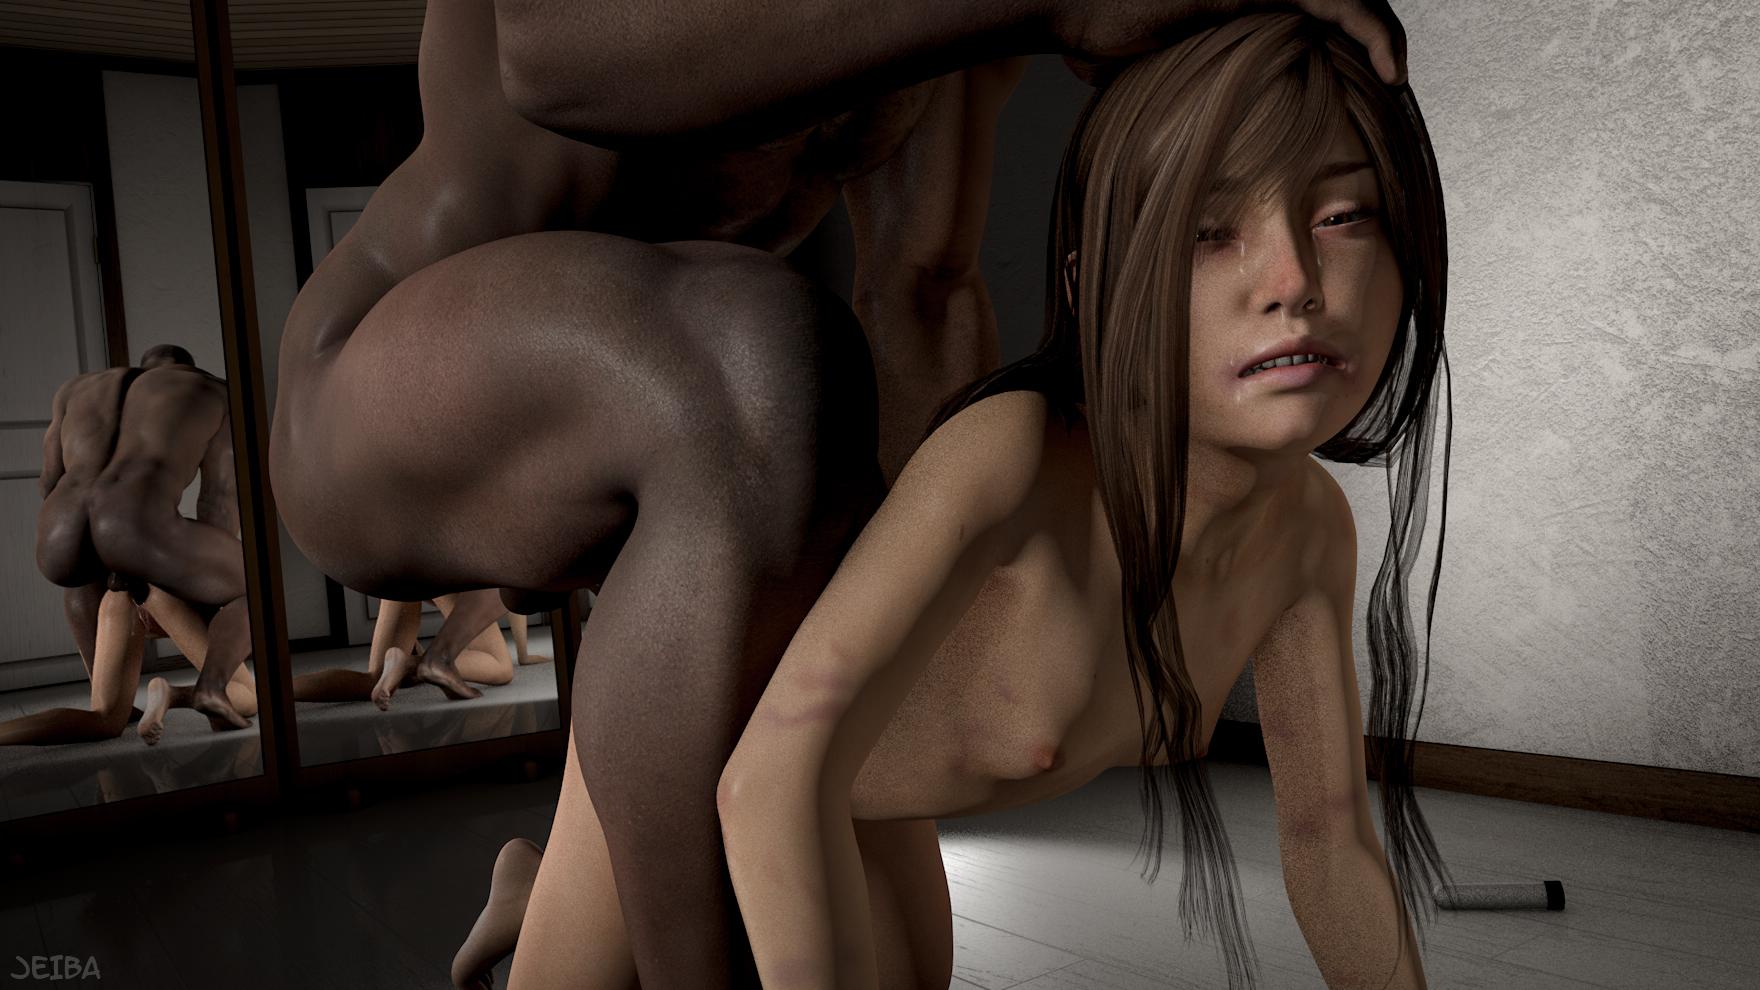 porno pics of sexy women gets fucks